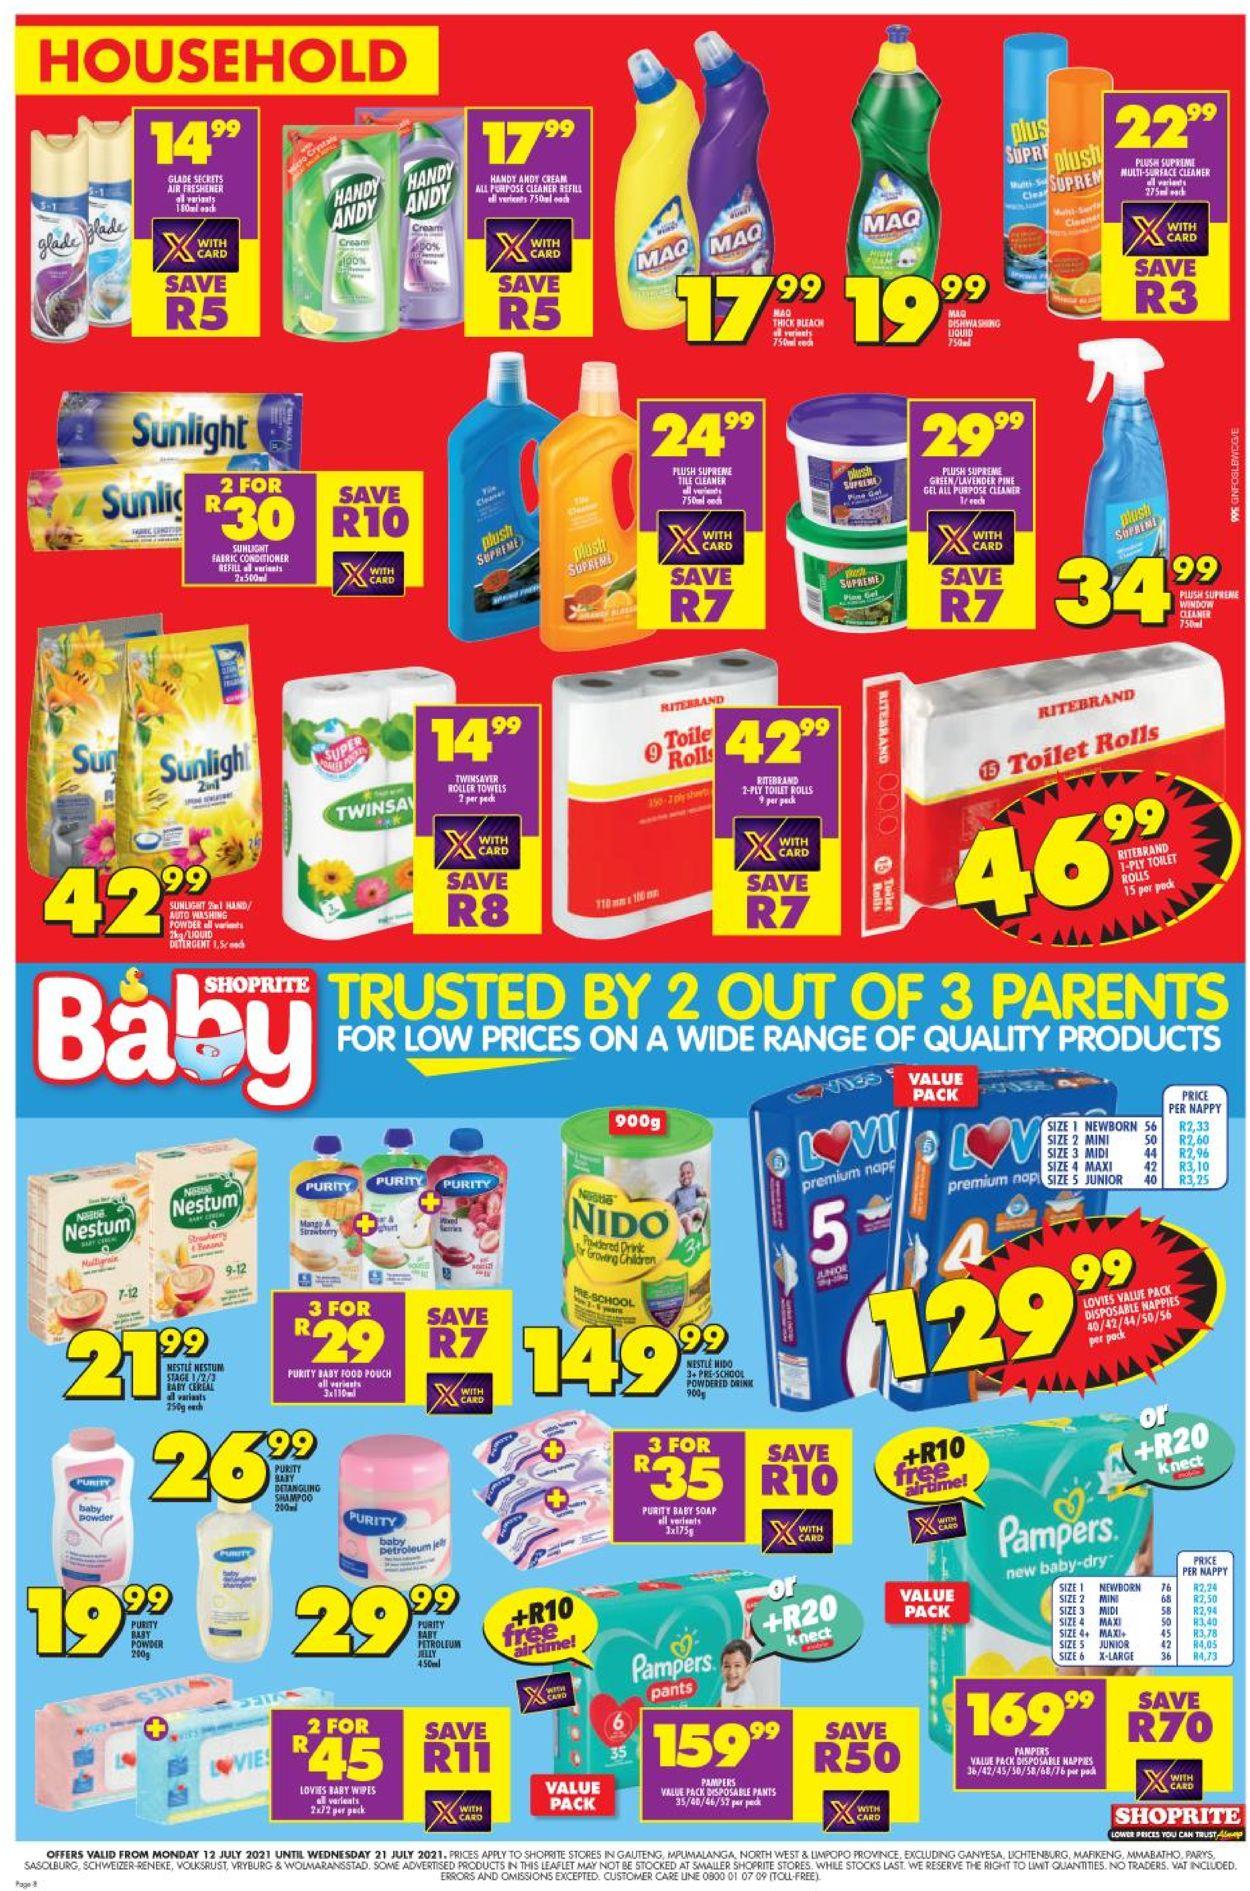 Shoprite Catalogue - 2021/07/12-2021/07/21 (Page 7)